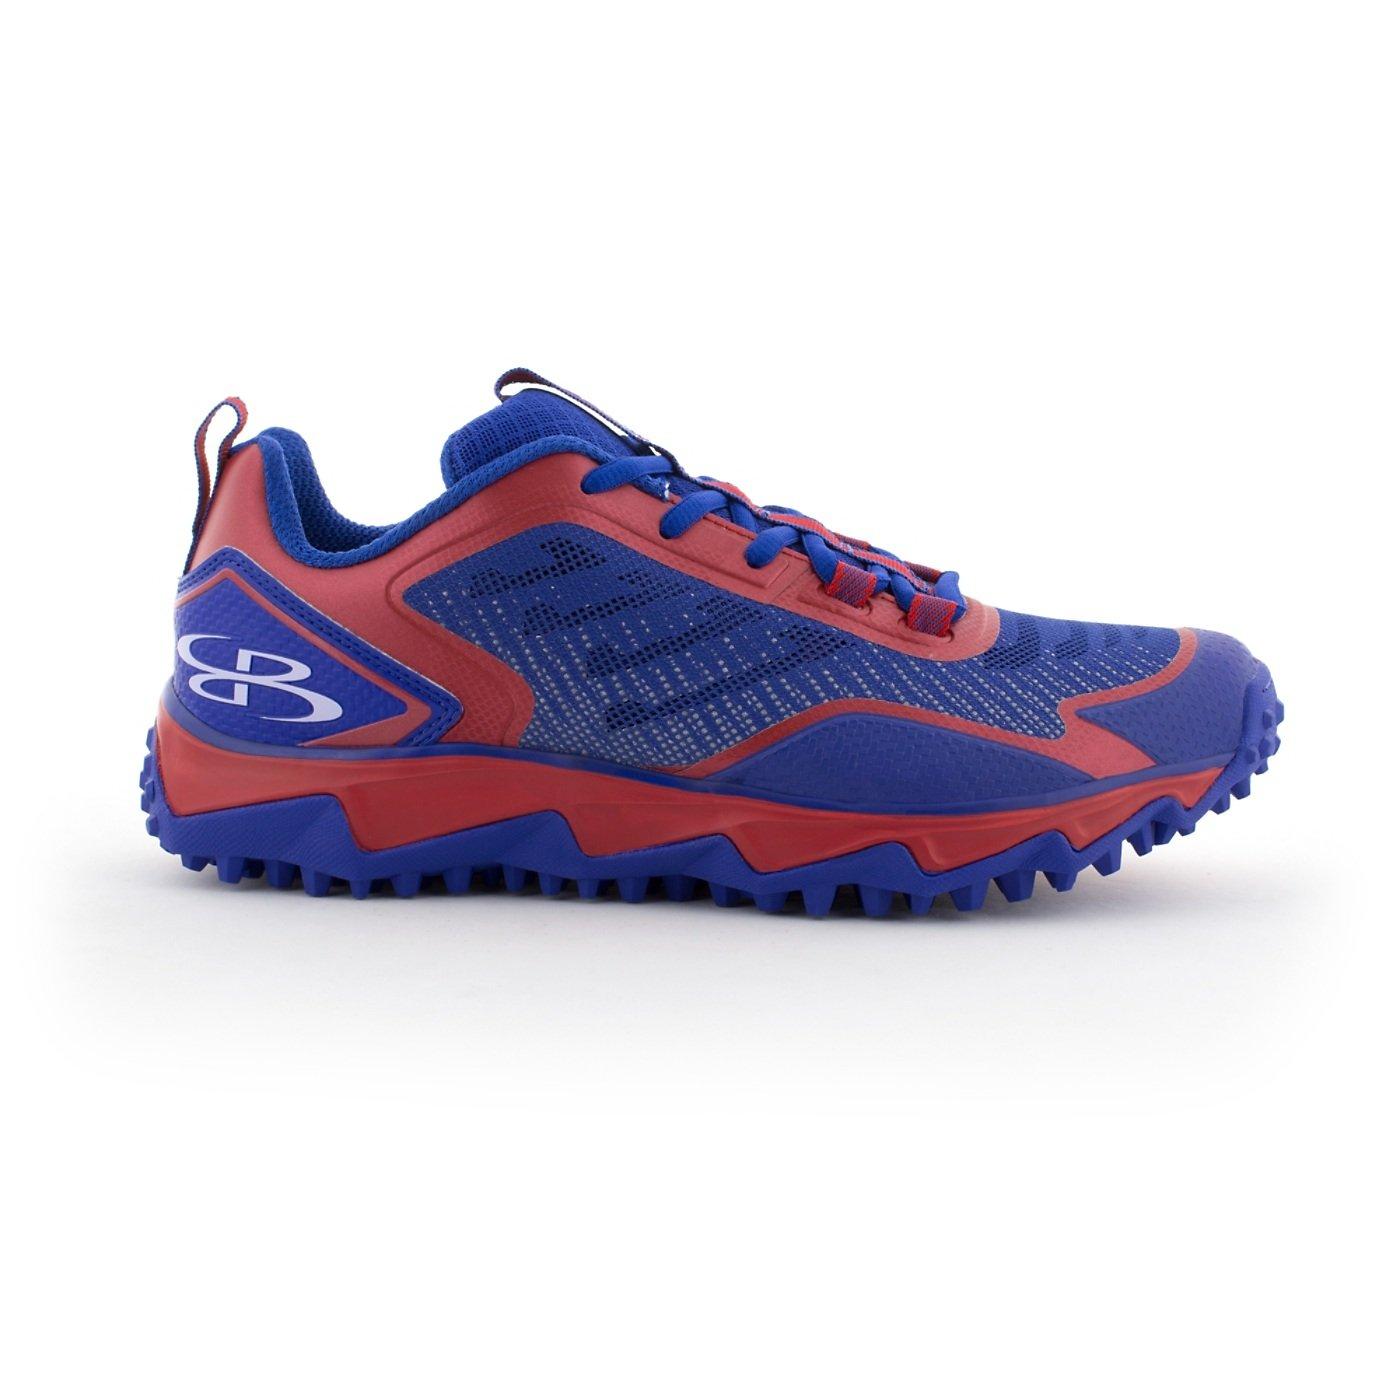 Boombah Men's Berzerk Turf Shoes - 13 Color Options - Multiple Sizes B076B3JQDP 13 Royal/Red